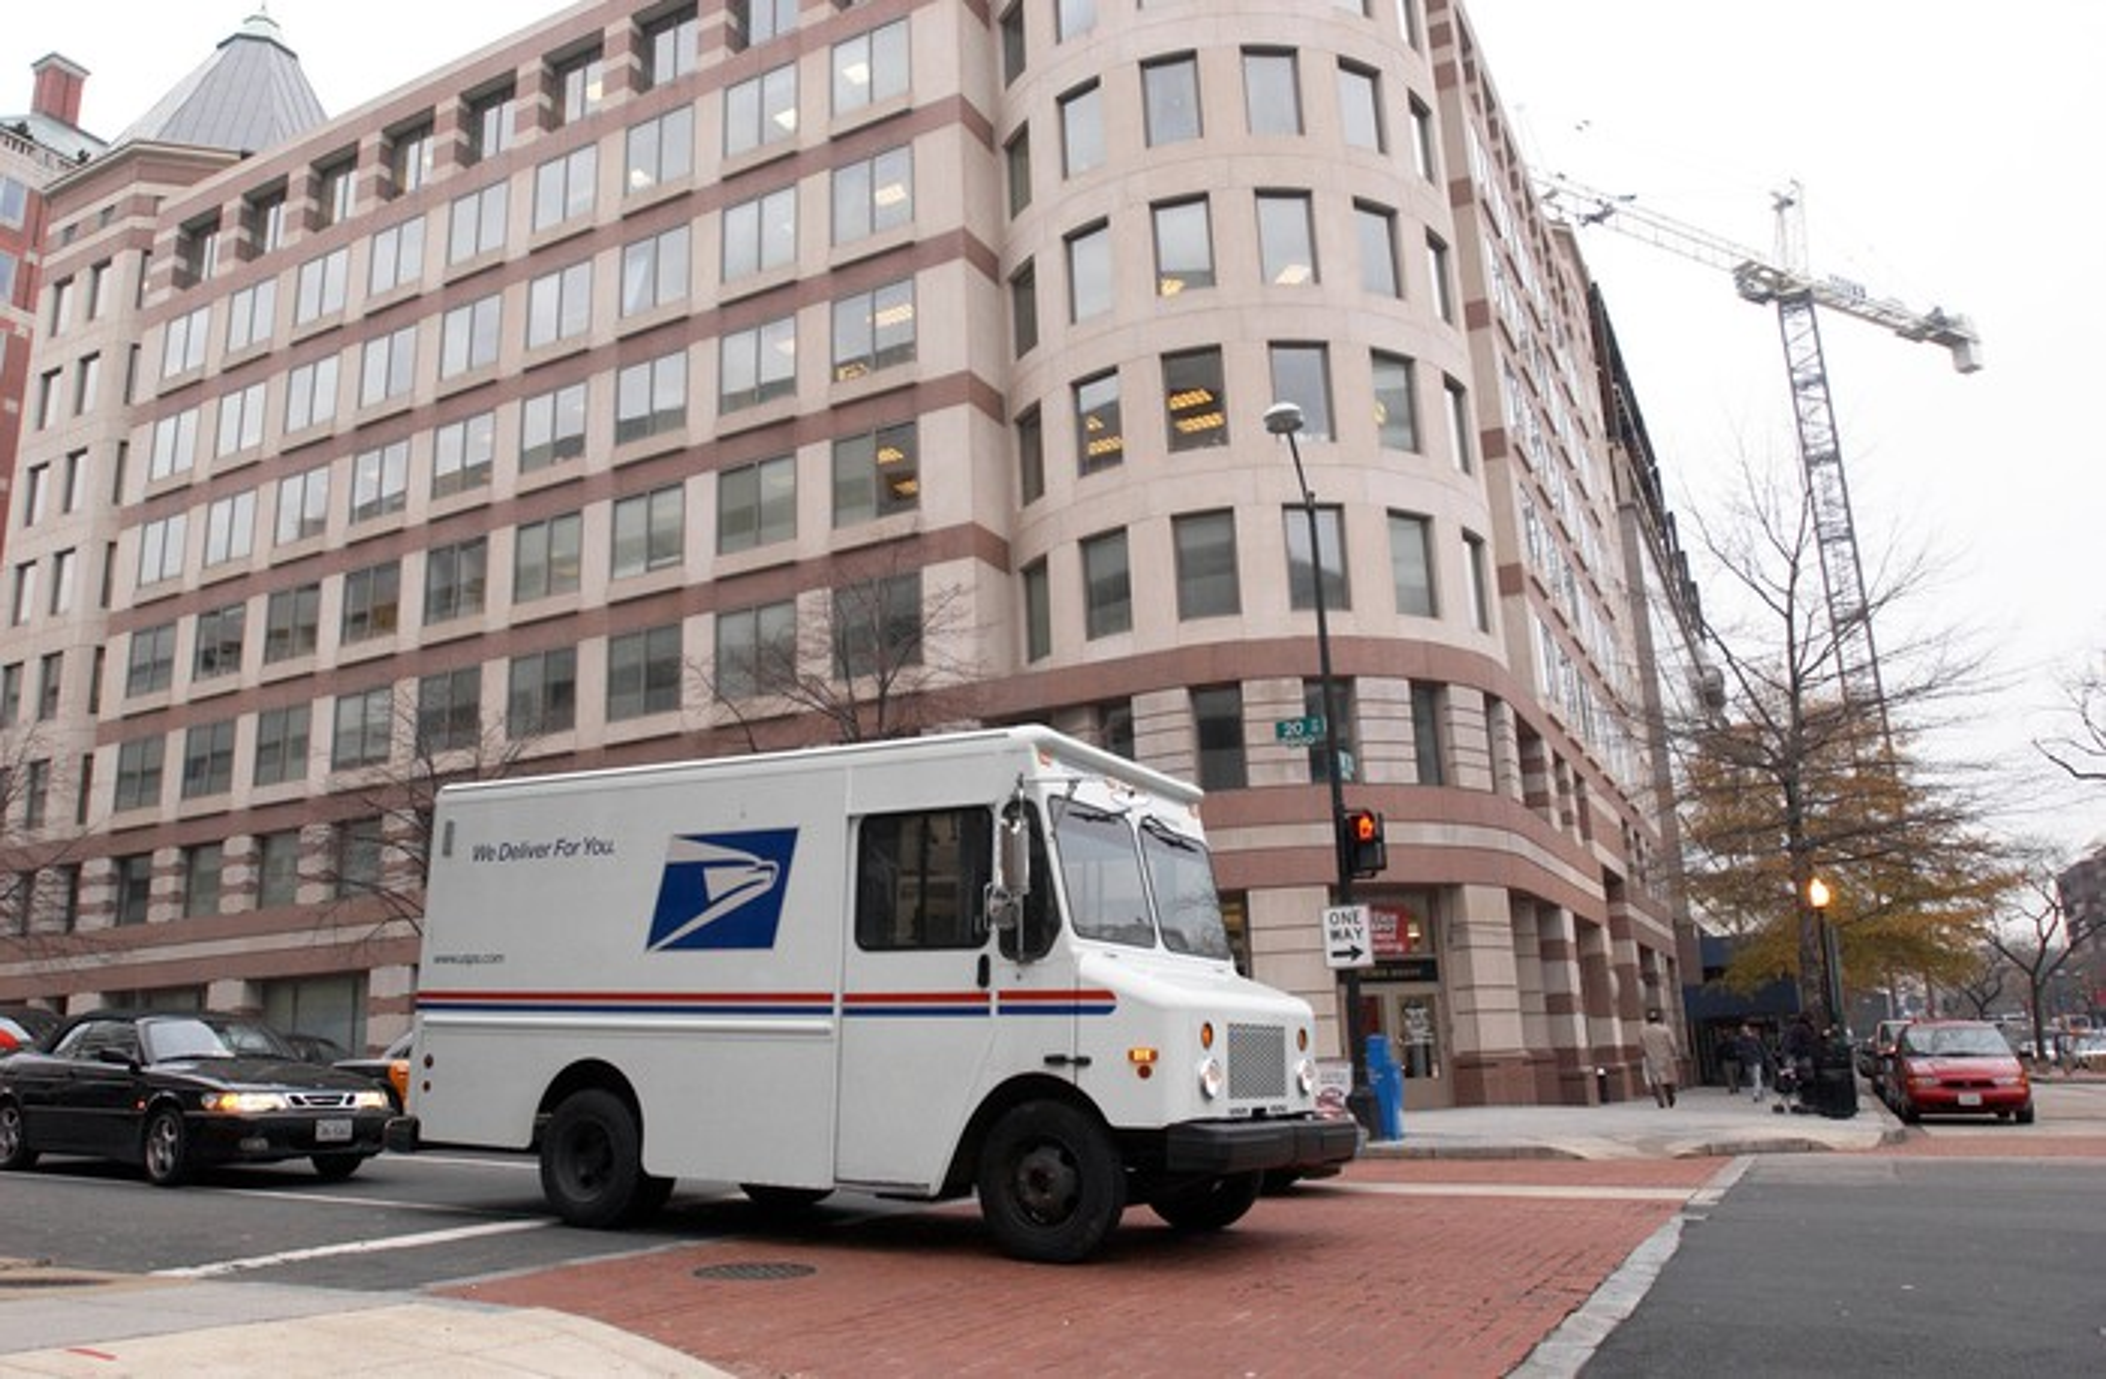 A U.S. Postal service truck driving down a city street.